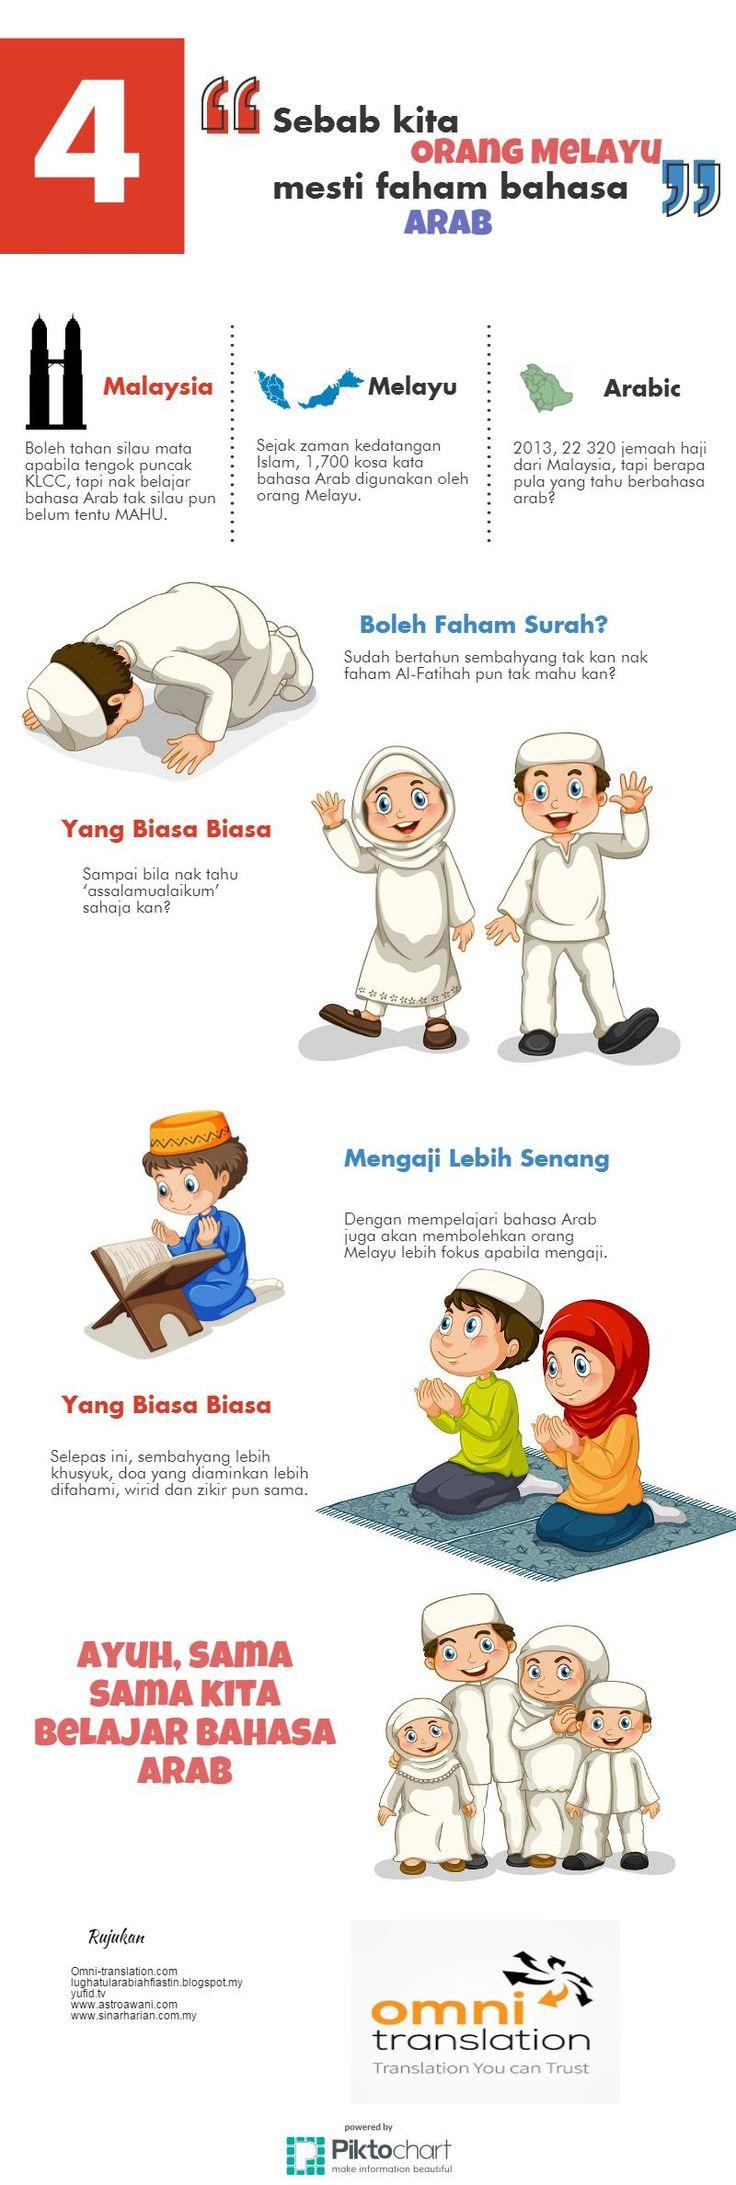 Kepentingan Mempelajari Bahasa Arab